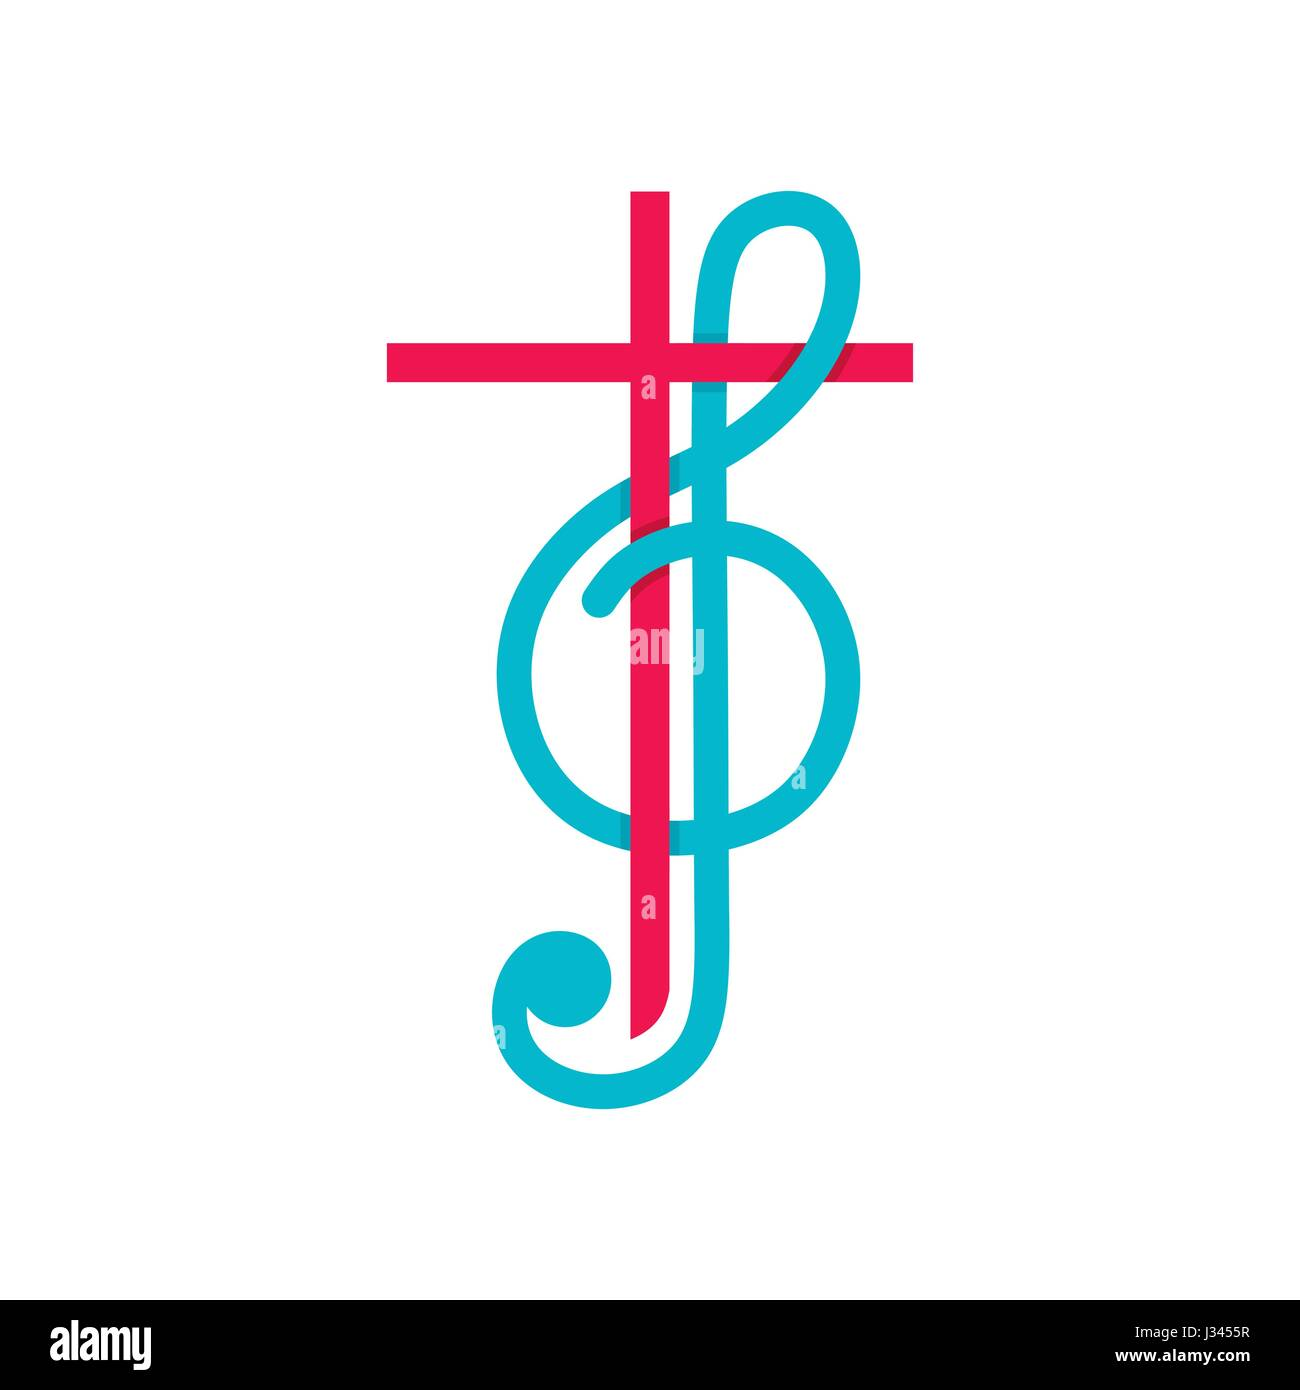 Church Logo Christian Symbols The Cross Of Jesus Christ And Treble